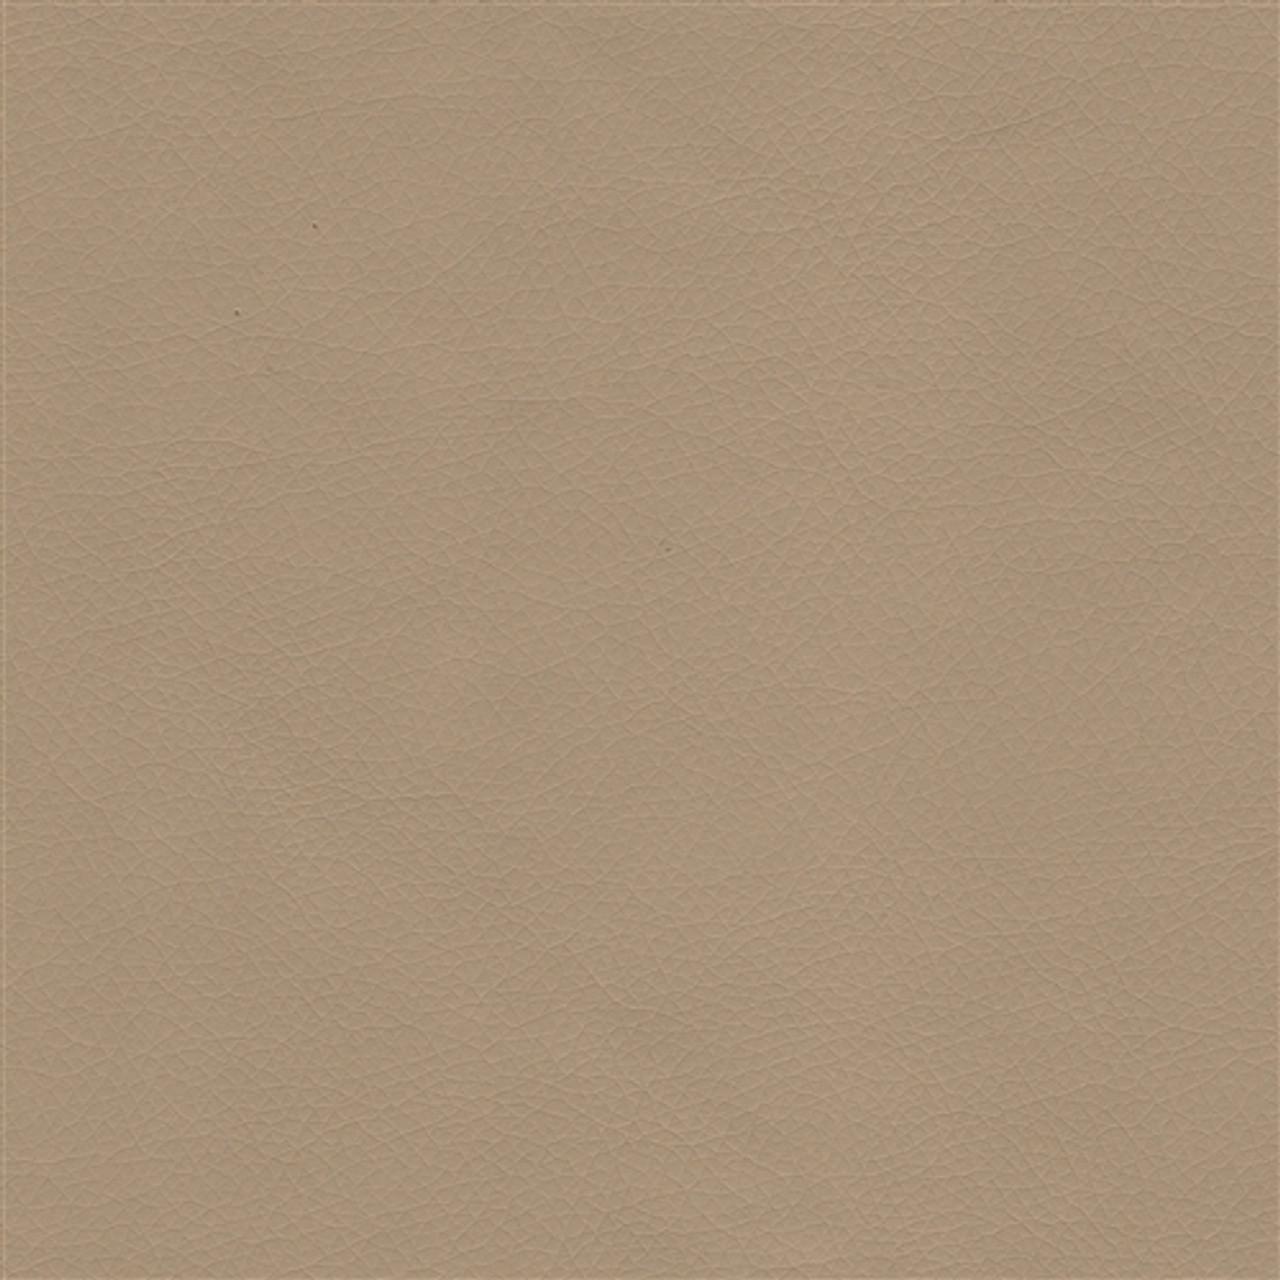 Caliber CAL-8105 Sandstone